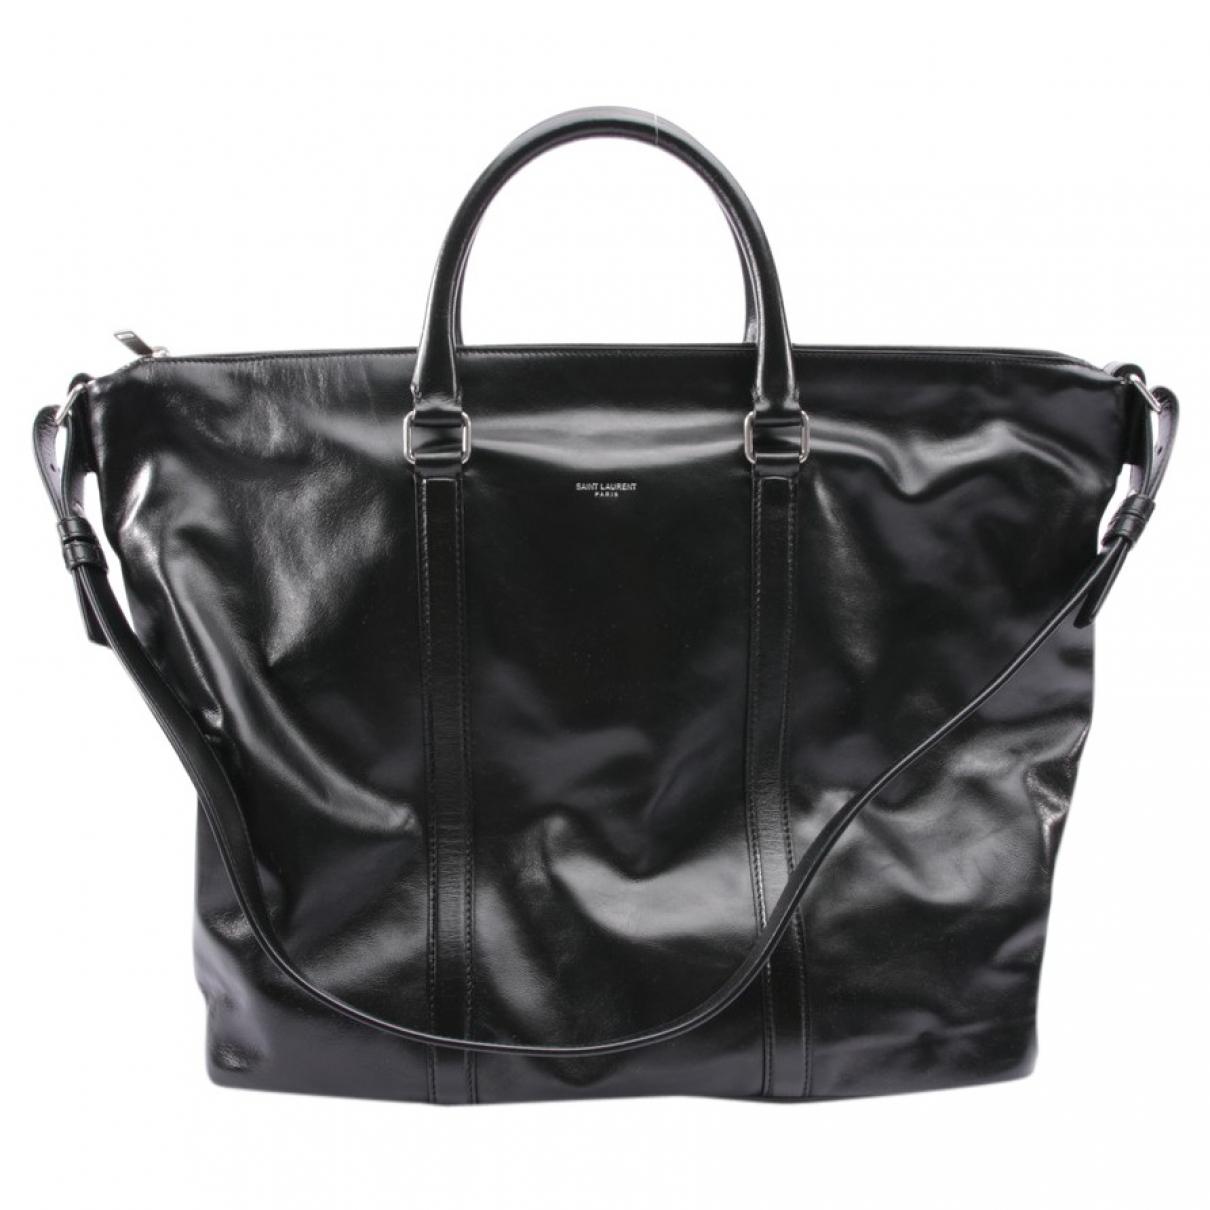 Saint Laurent Duffle Black Leather handbag for Women \N